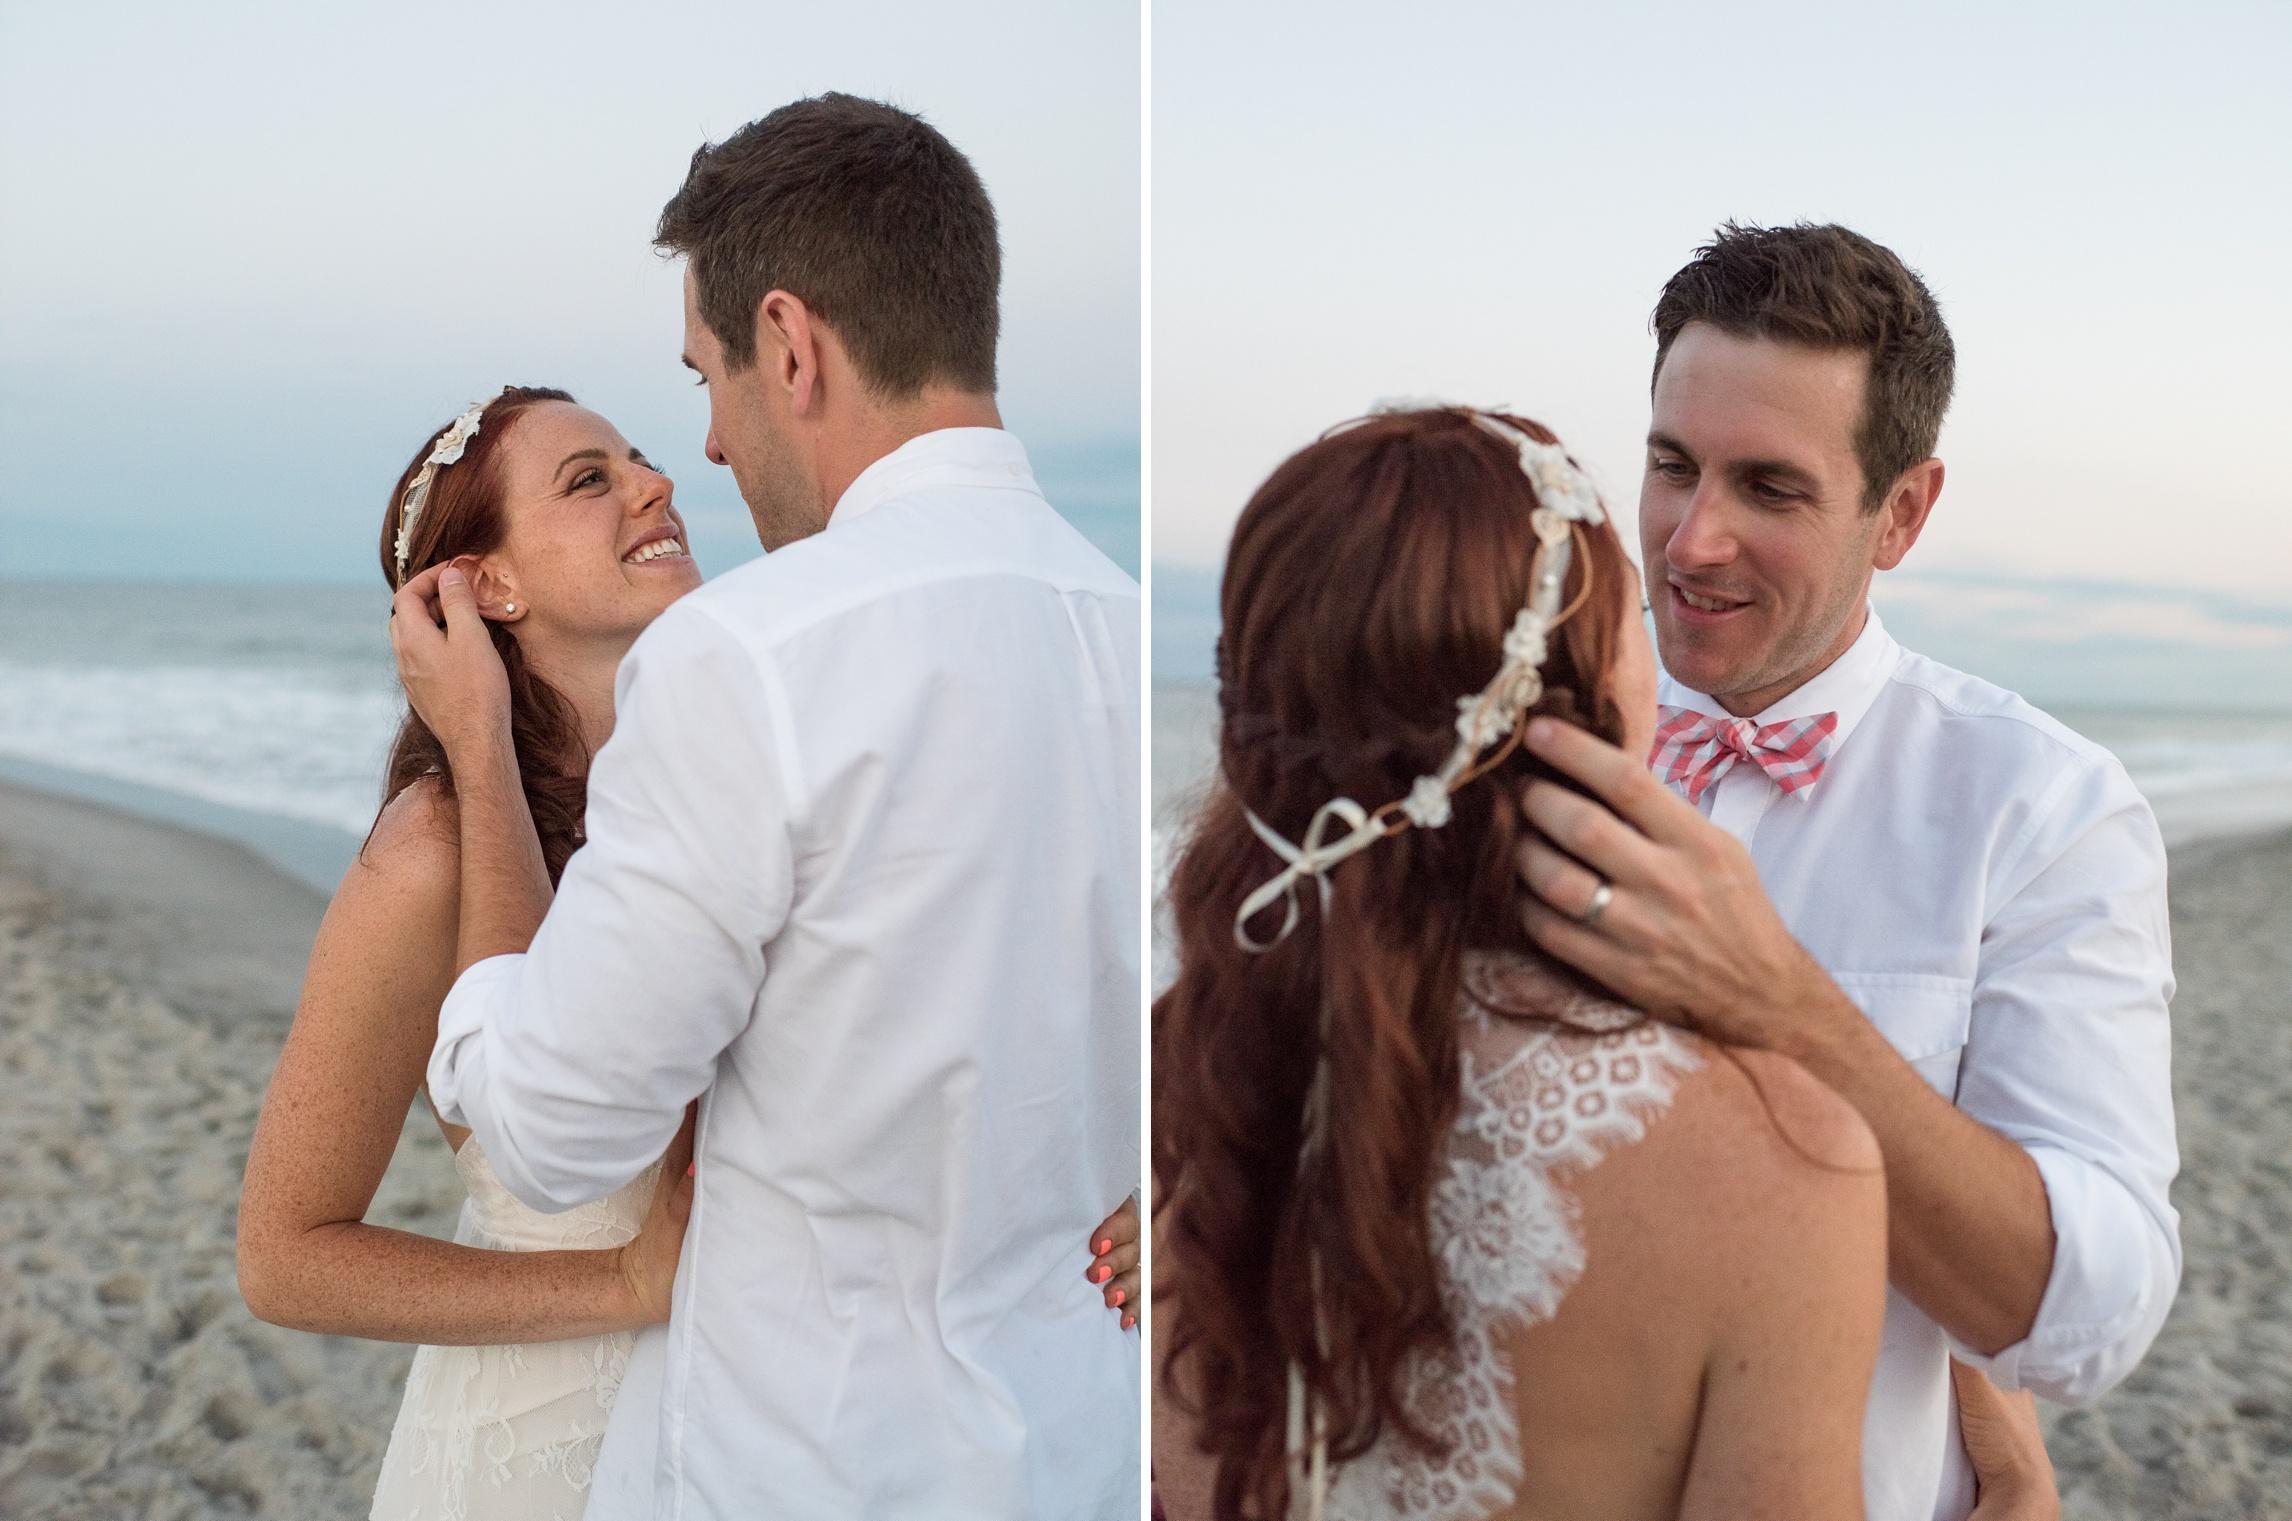 myrtle-atlantic-ocean-beach-south-carolina-Sonja-k-photography-sonjakphotography-honest-married-film-is-not-dead-best-fort-collins-redhead-northern-colorado-piedmont-good-creative-front-range-wedding-photographer-salzburg-rocky-mountains-meet-the-plains-look-portraits-family-southern-travel-destination-wyoming-artistic-denver-boulder-natural-lgbtq-gay-new-orleans-berlin-california-oakland-bride-groom-couple-outdoor-loveland-windsor-mountain-national-park-longmont-berthoud-embrace-kiss